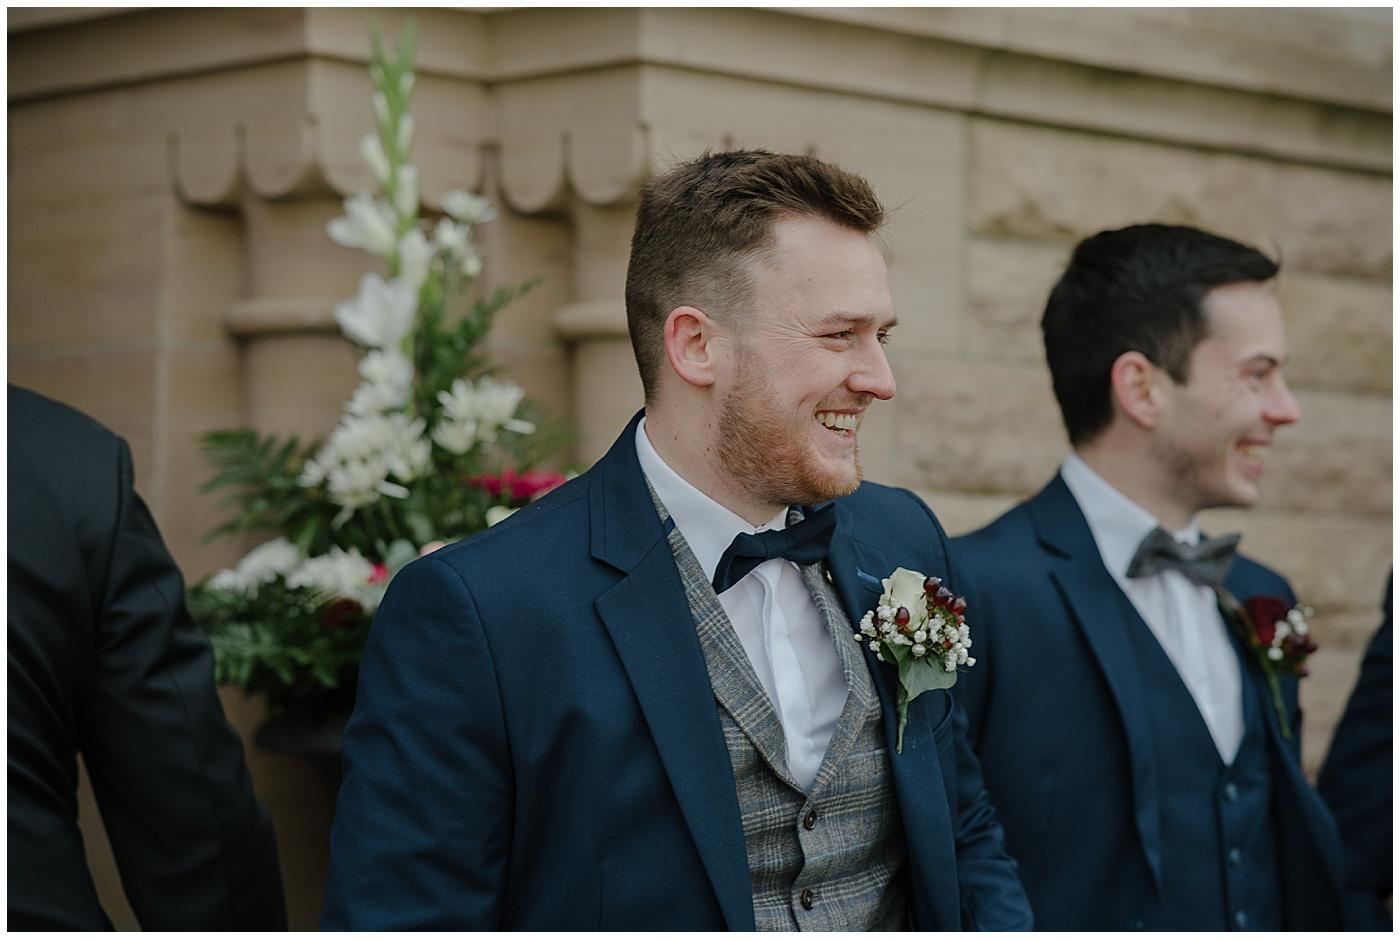 lissan-house-wedding-jude-browne-photography_0023.jpg